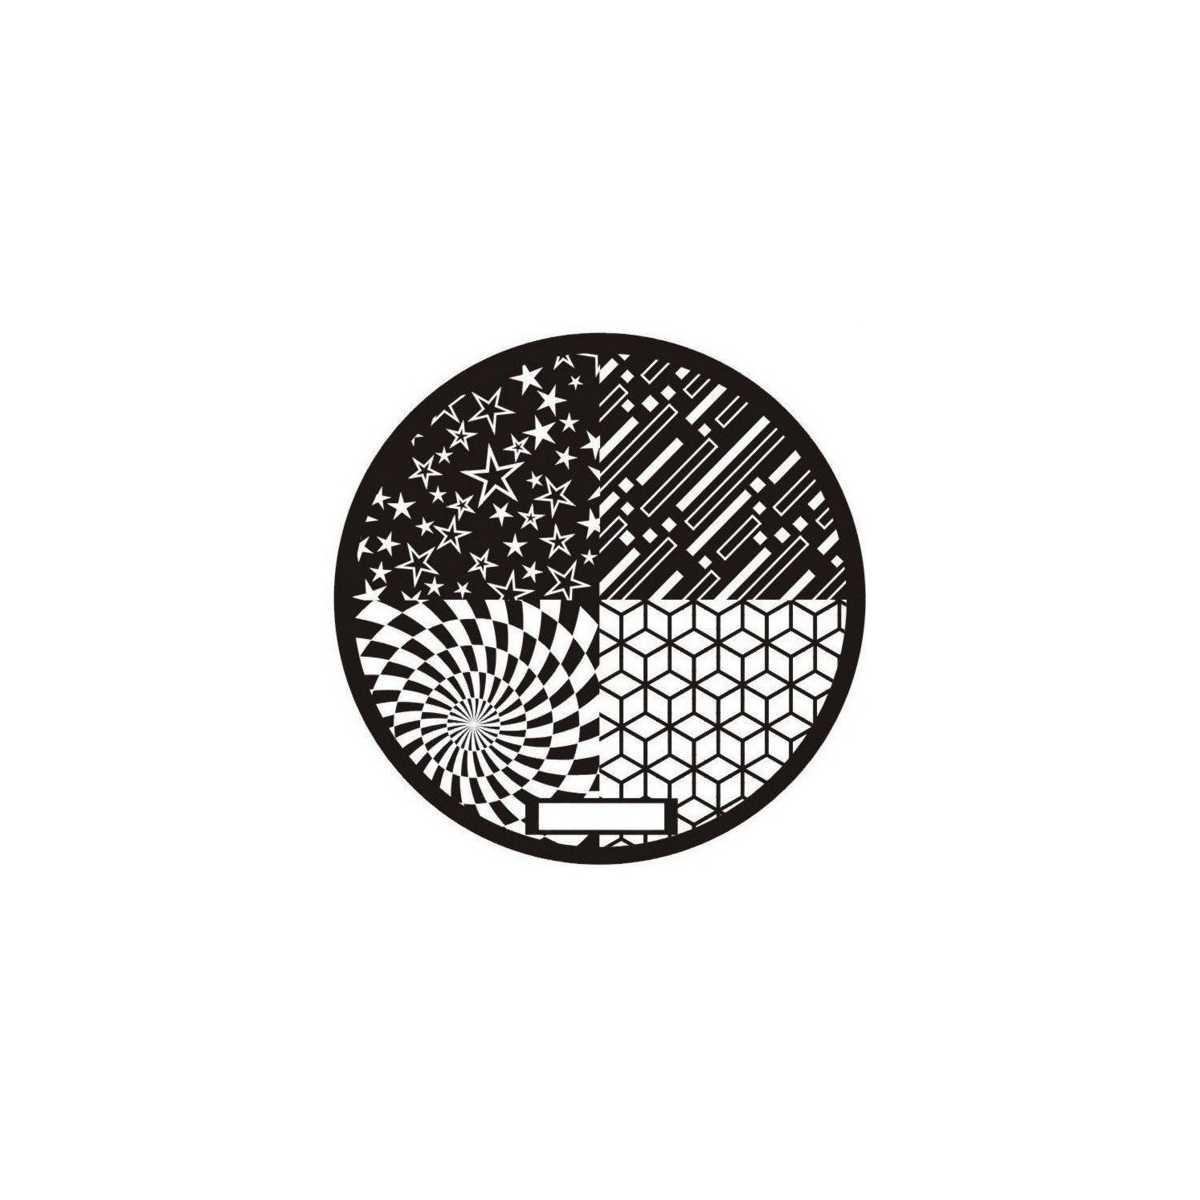 https://www.kit-manucure.com/846-thickbox_default/plaque-de-stamping-spirale-etoiles-et-tumbling-blocks.jpg